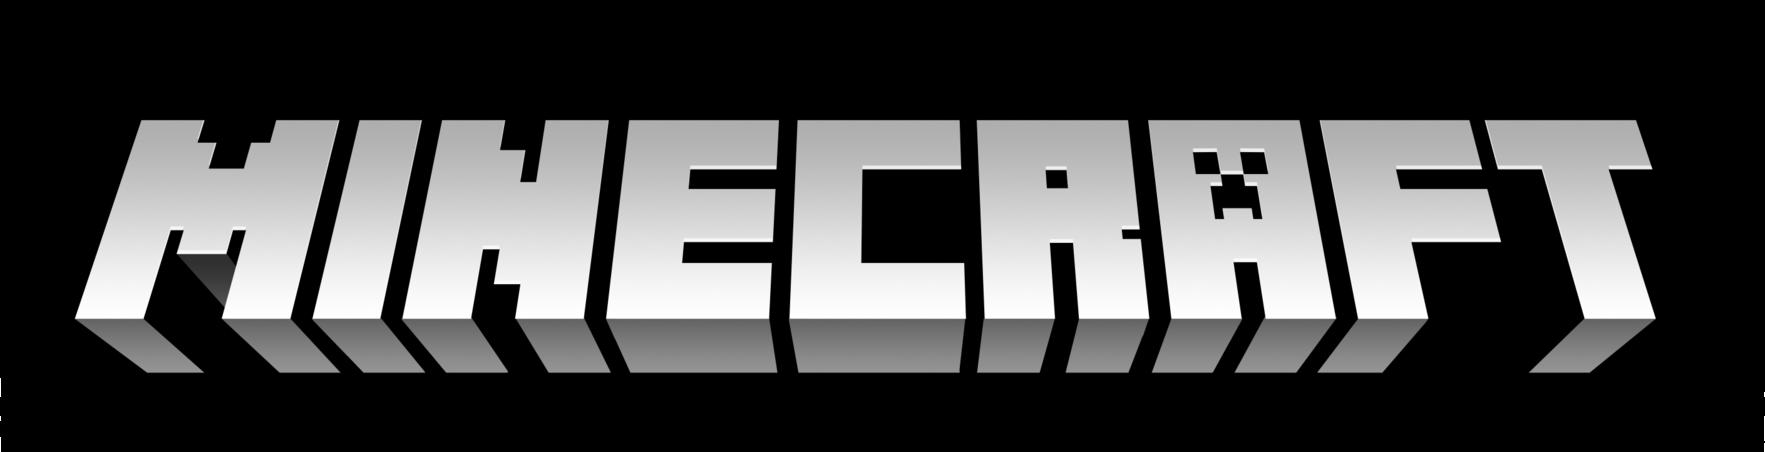 Minecraft clipart minecraft logo, Minecraft minecraft logo.